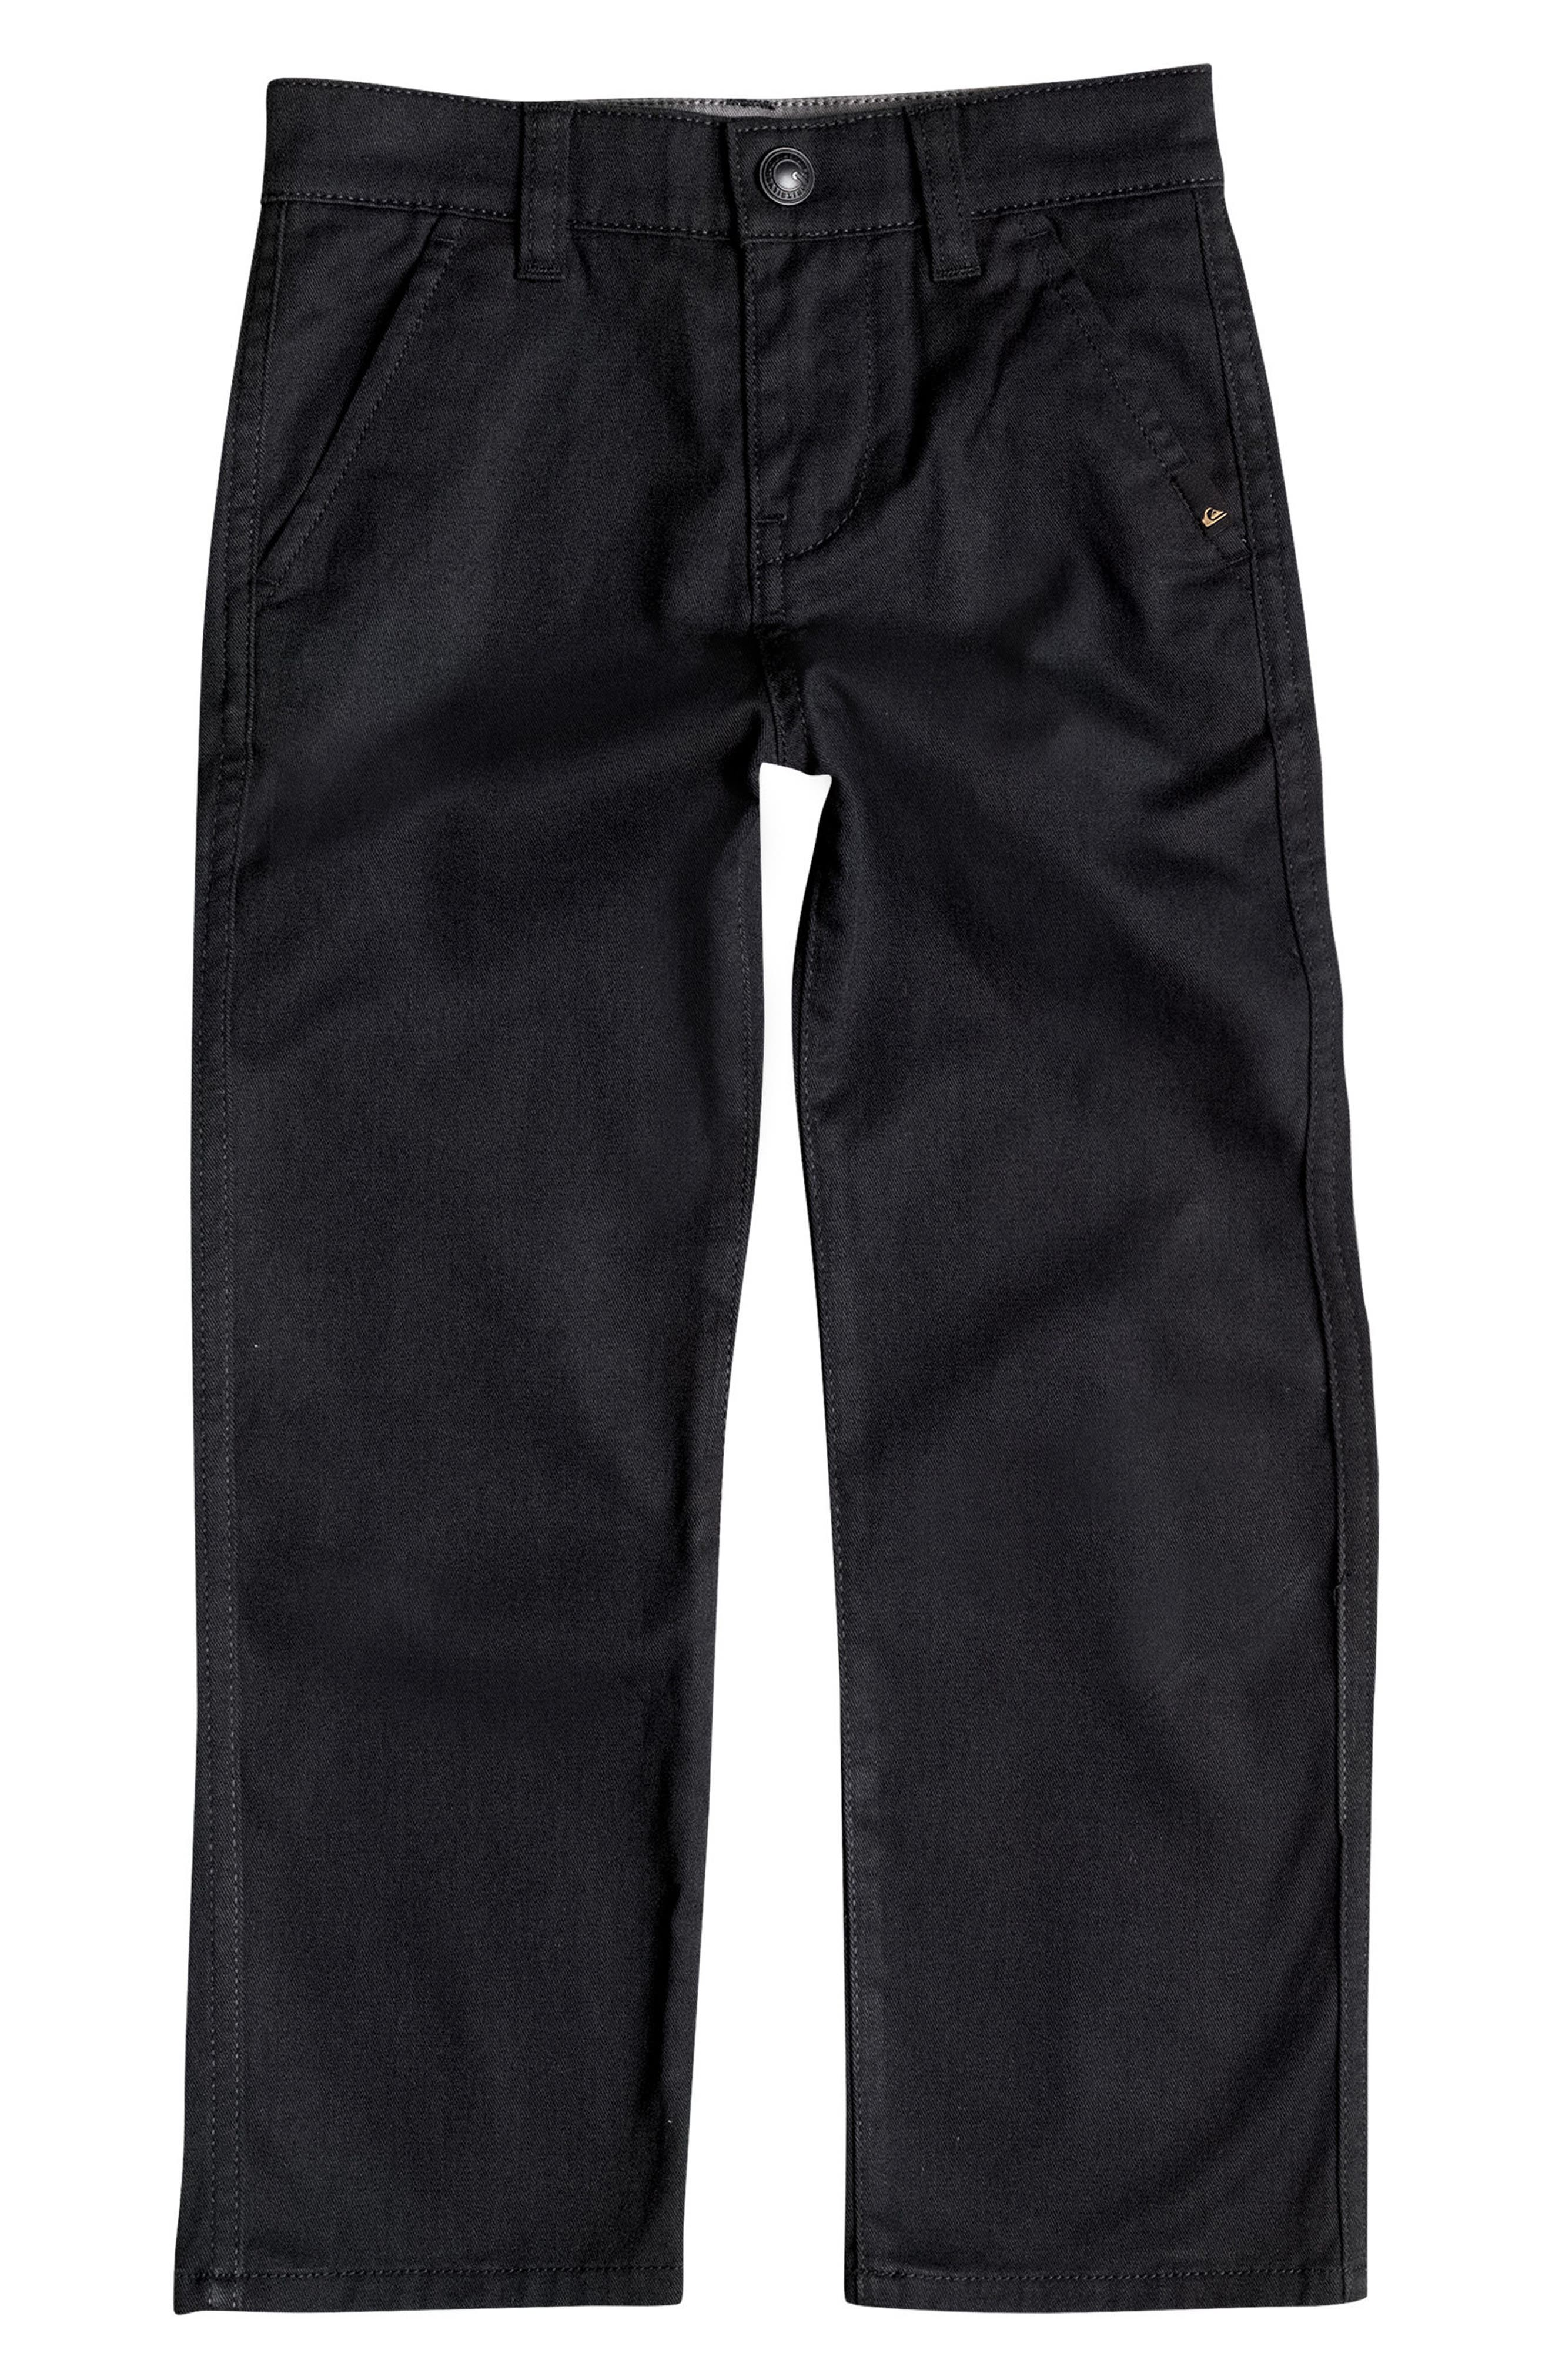 Everyday Union Pants,                         Main,                         color, Black